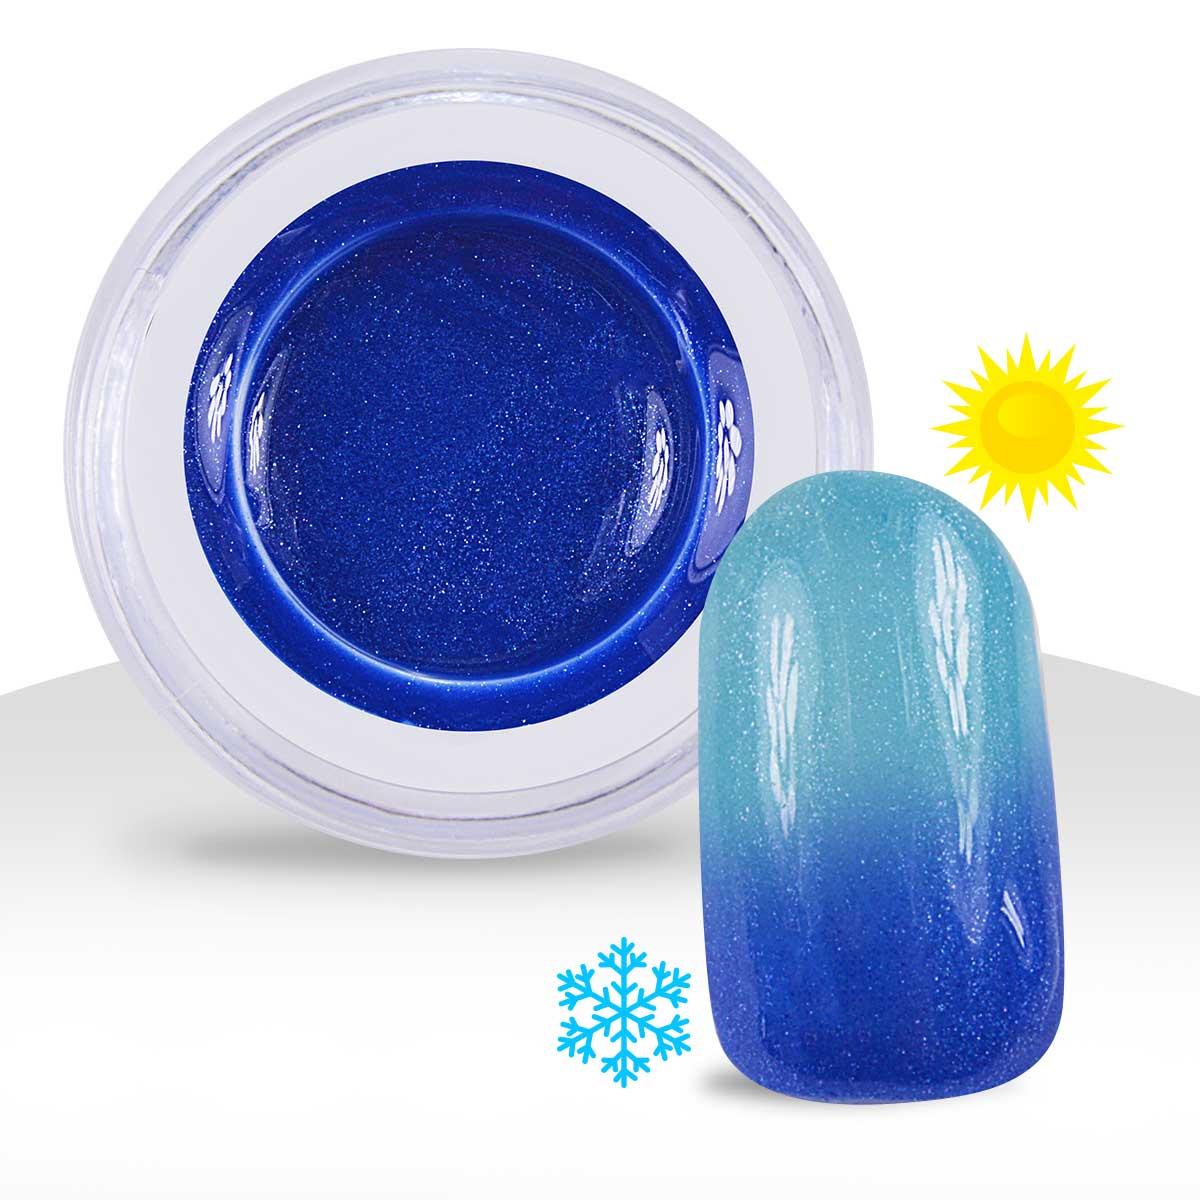 gel uv couleur m tallis thermo bleu fonc bleu lagon 5ml manucure ongles na ebay. Black Bedroom Furniture Sets. Home Design Ideas